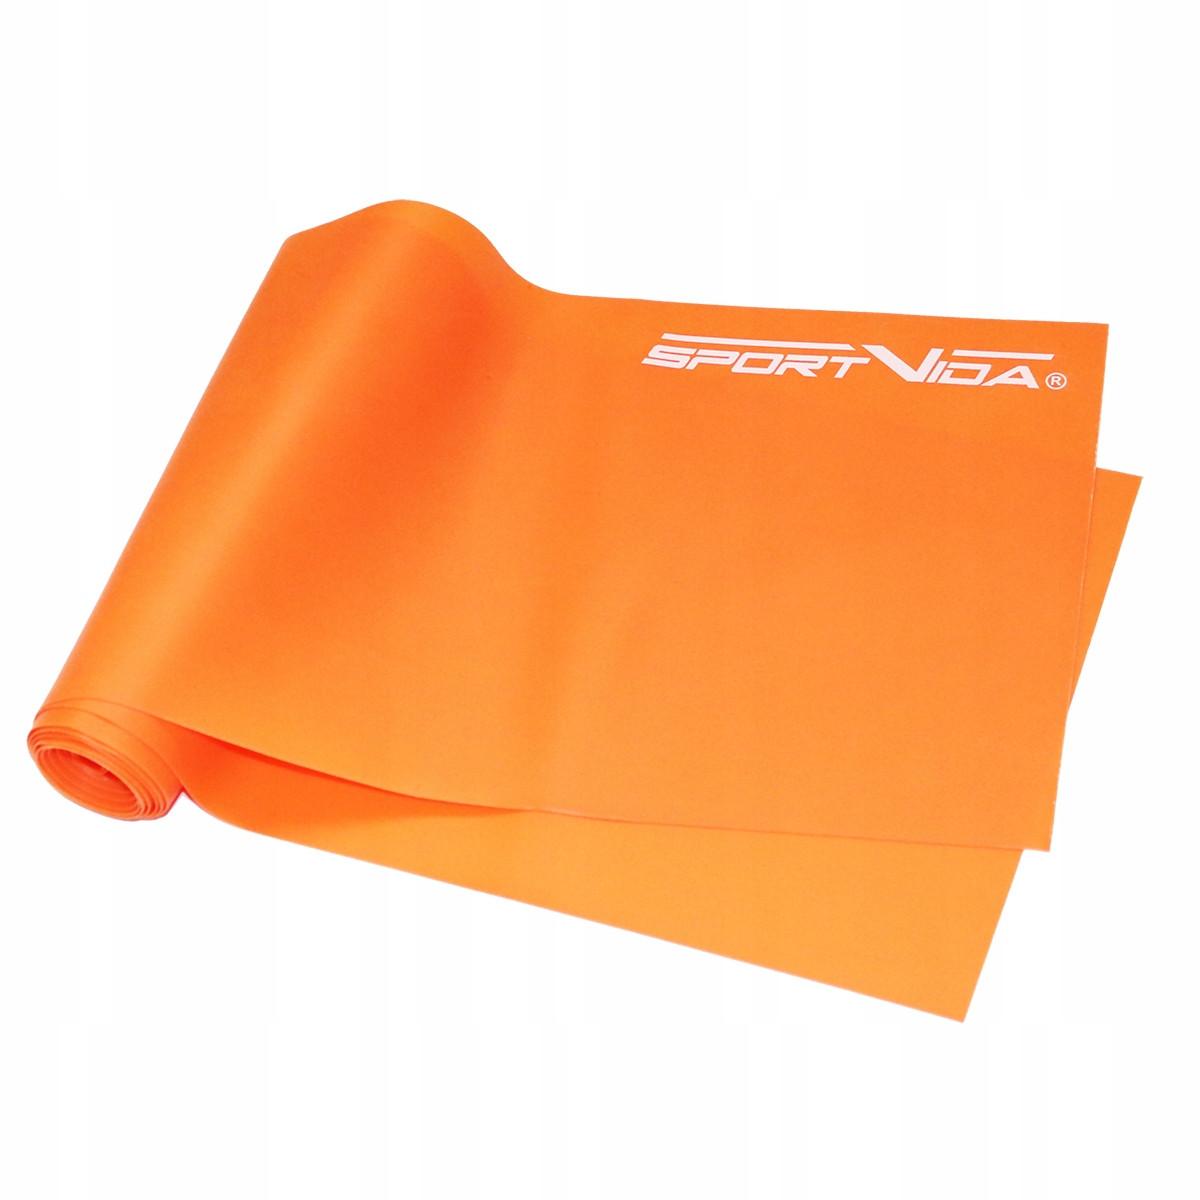 Стрічка-еспандер для спорту і реабілітації SportVida Flat Stretch Band 200 х 15 см 5-10 кг SV-HK0185